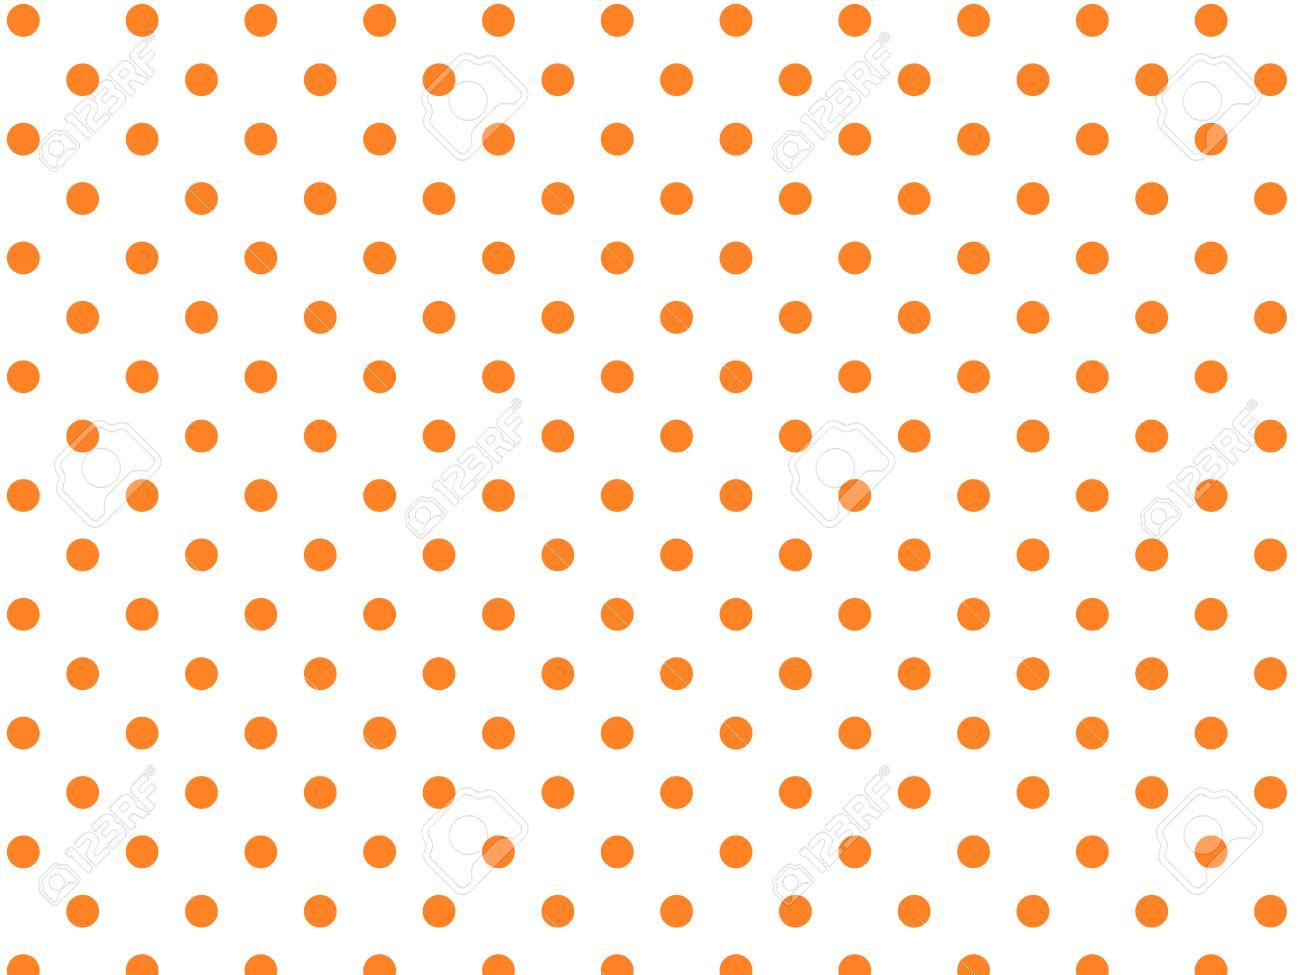 White background with orange polka dots (eps8) - 7359882